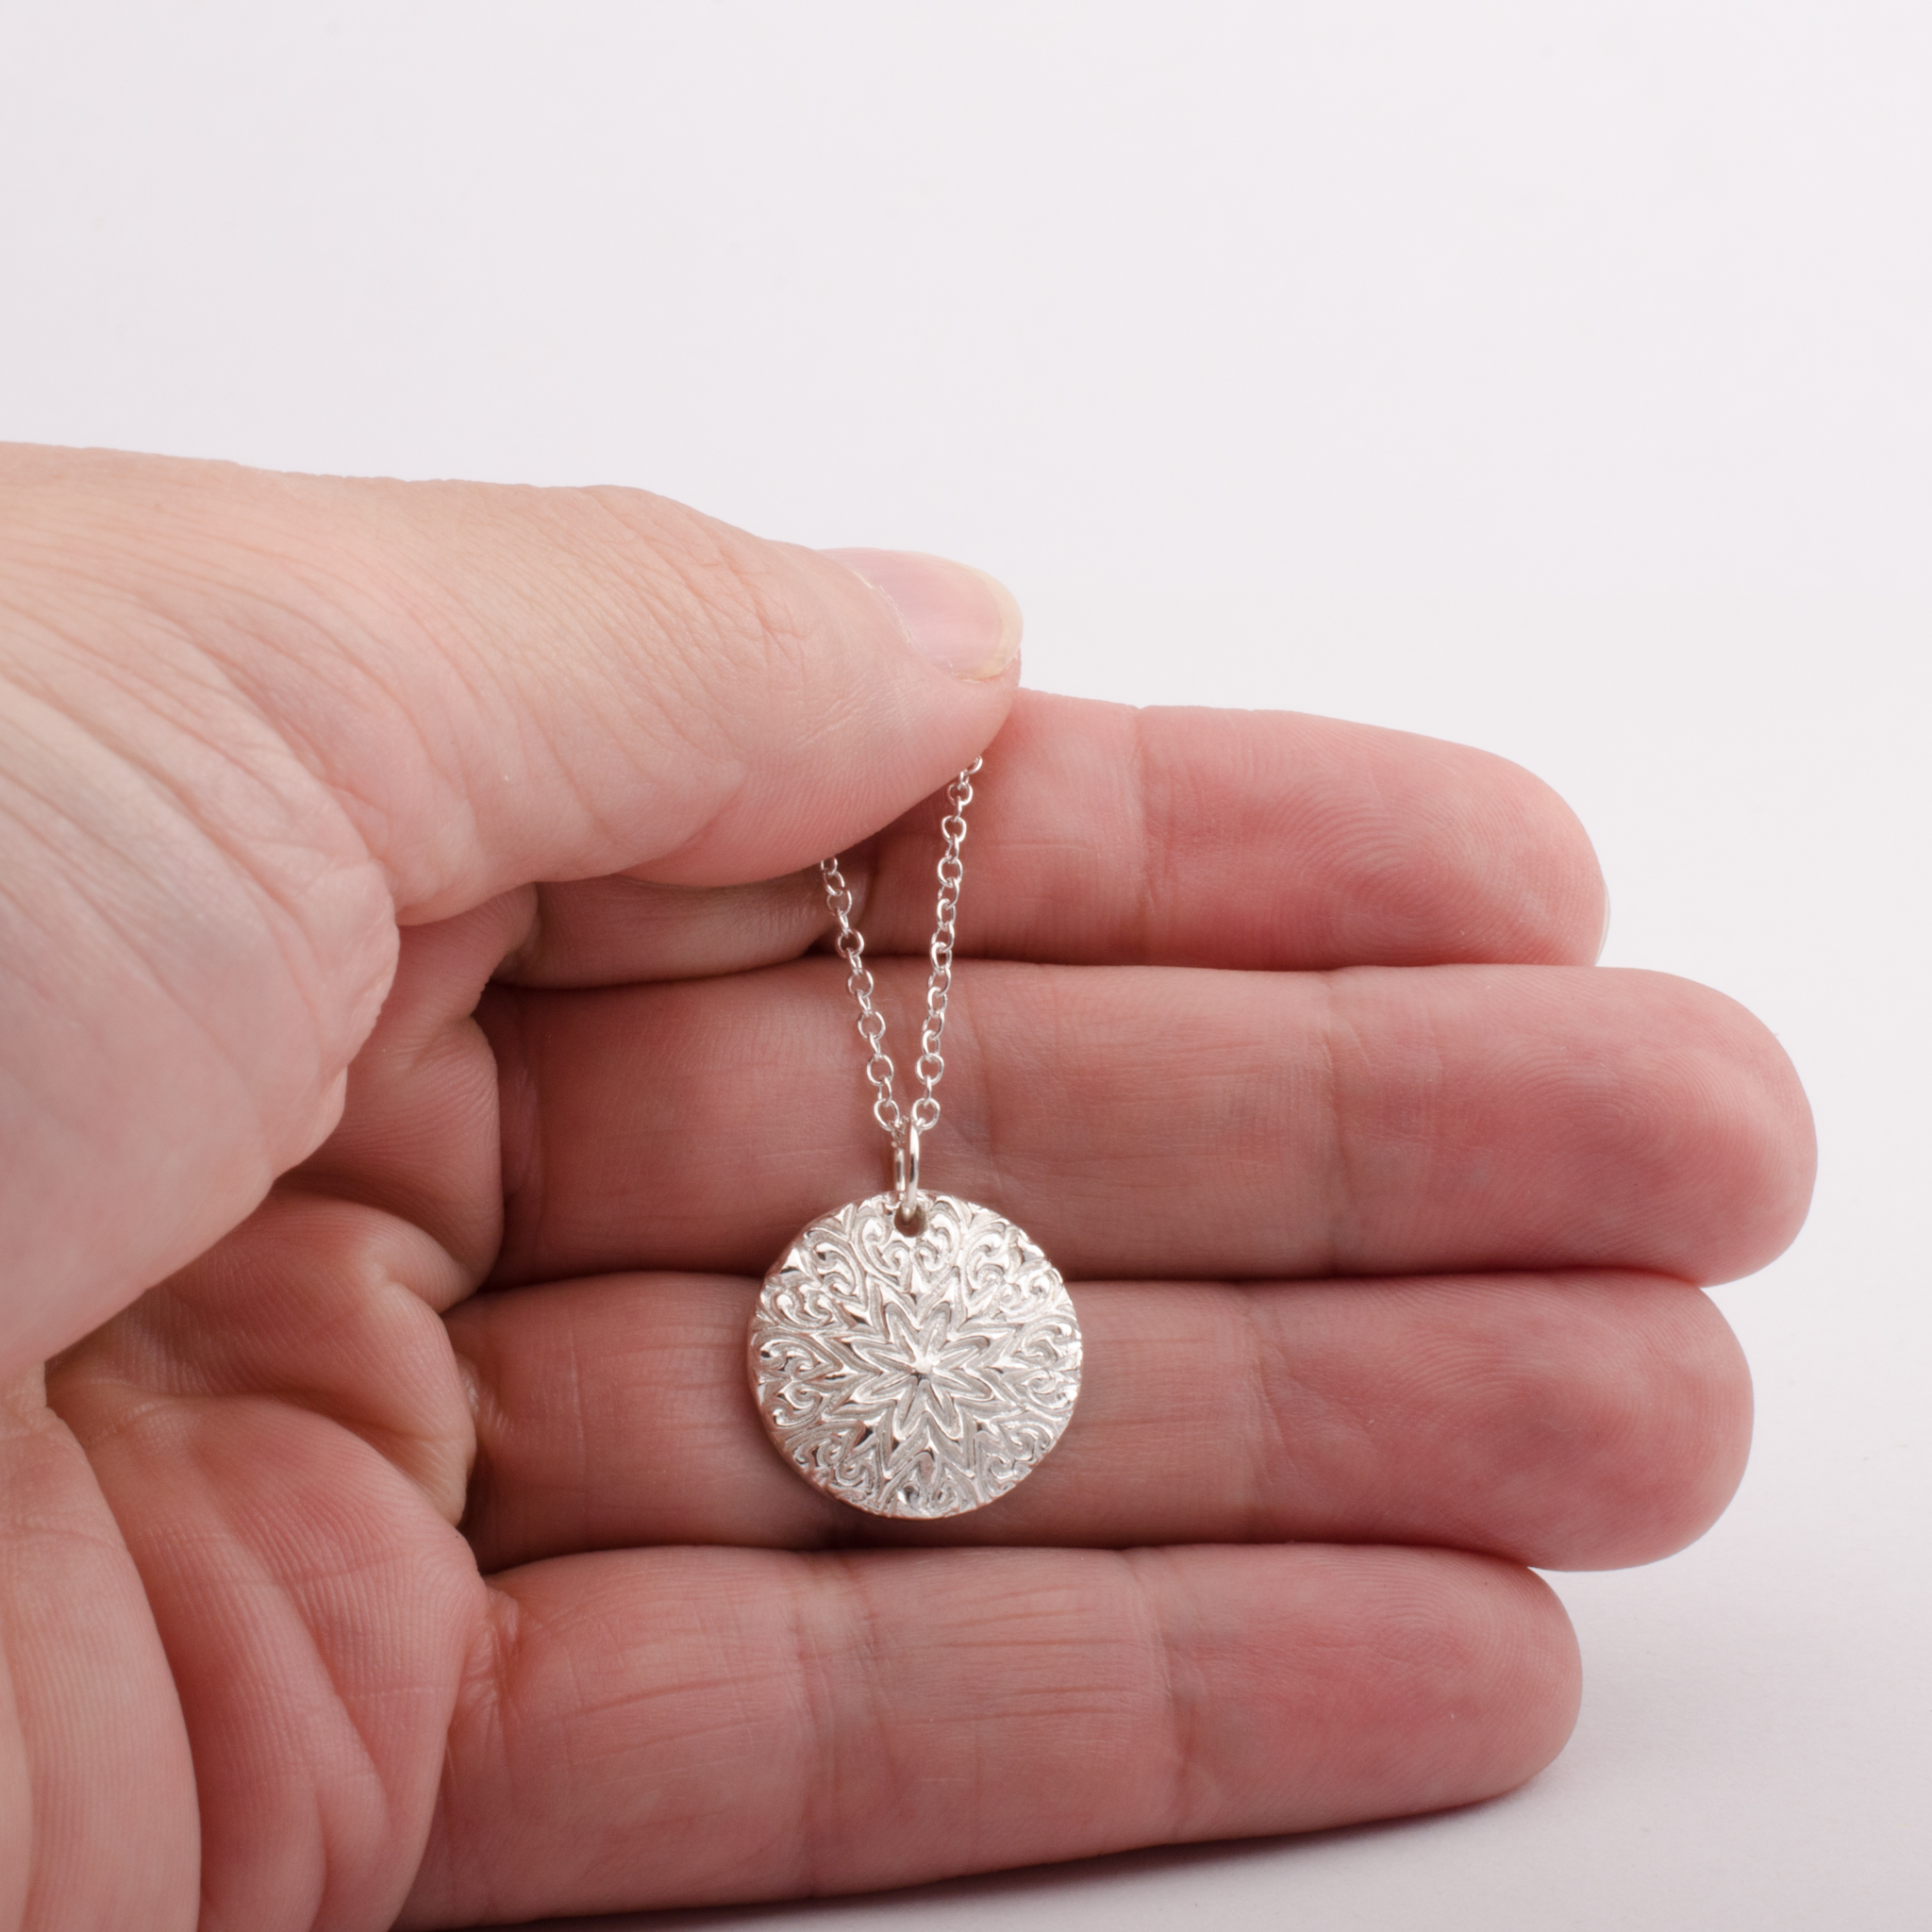 Mandala Star Silver Pendant Necklace